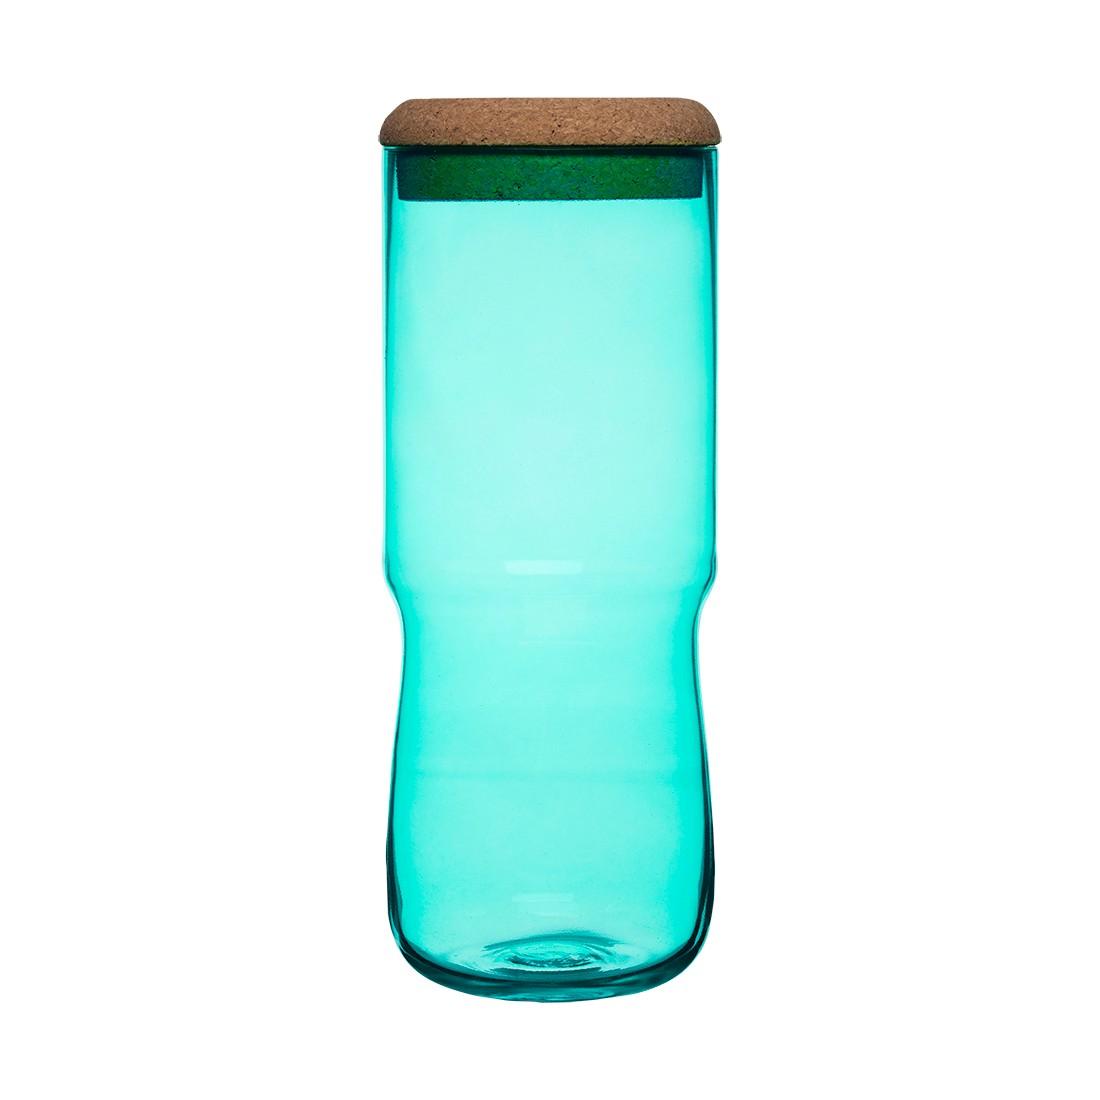 Vorratsglas Aqua – Mundgeblasenes Glas, Korkdeckel Grün – 30 cm, SEA glasbruk günstig online kaufen